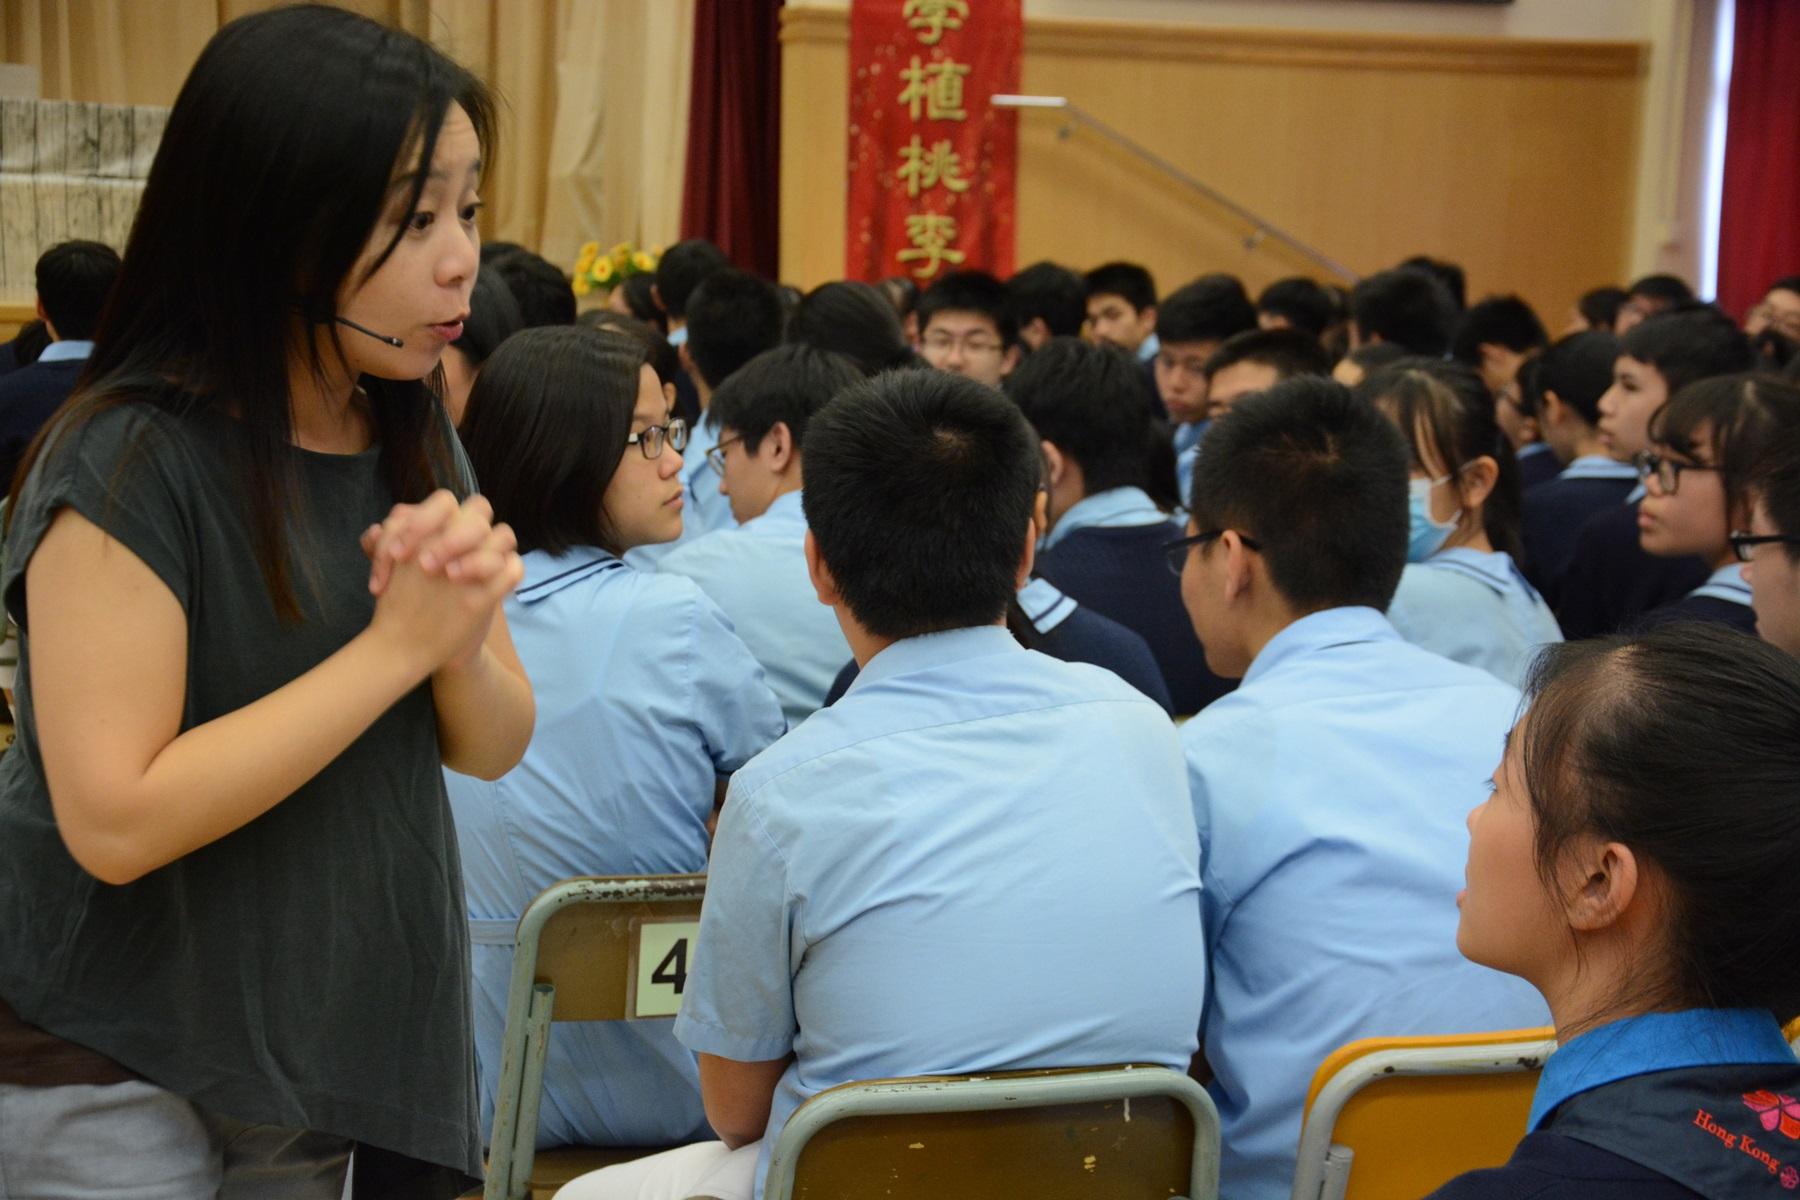 http://www.npc.edu.hk/sites/default/files/dsc_7359.jpg